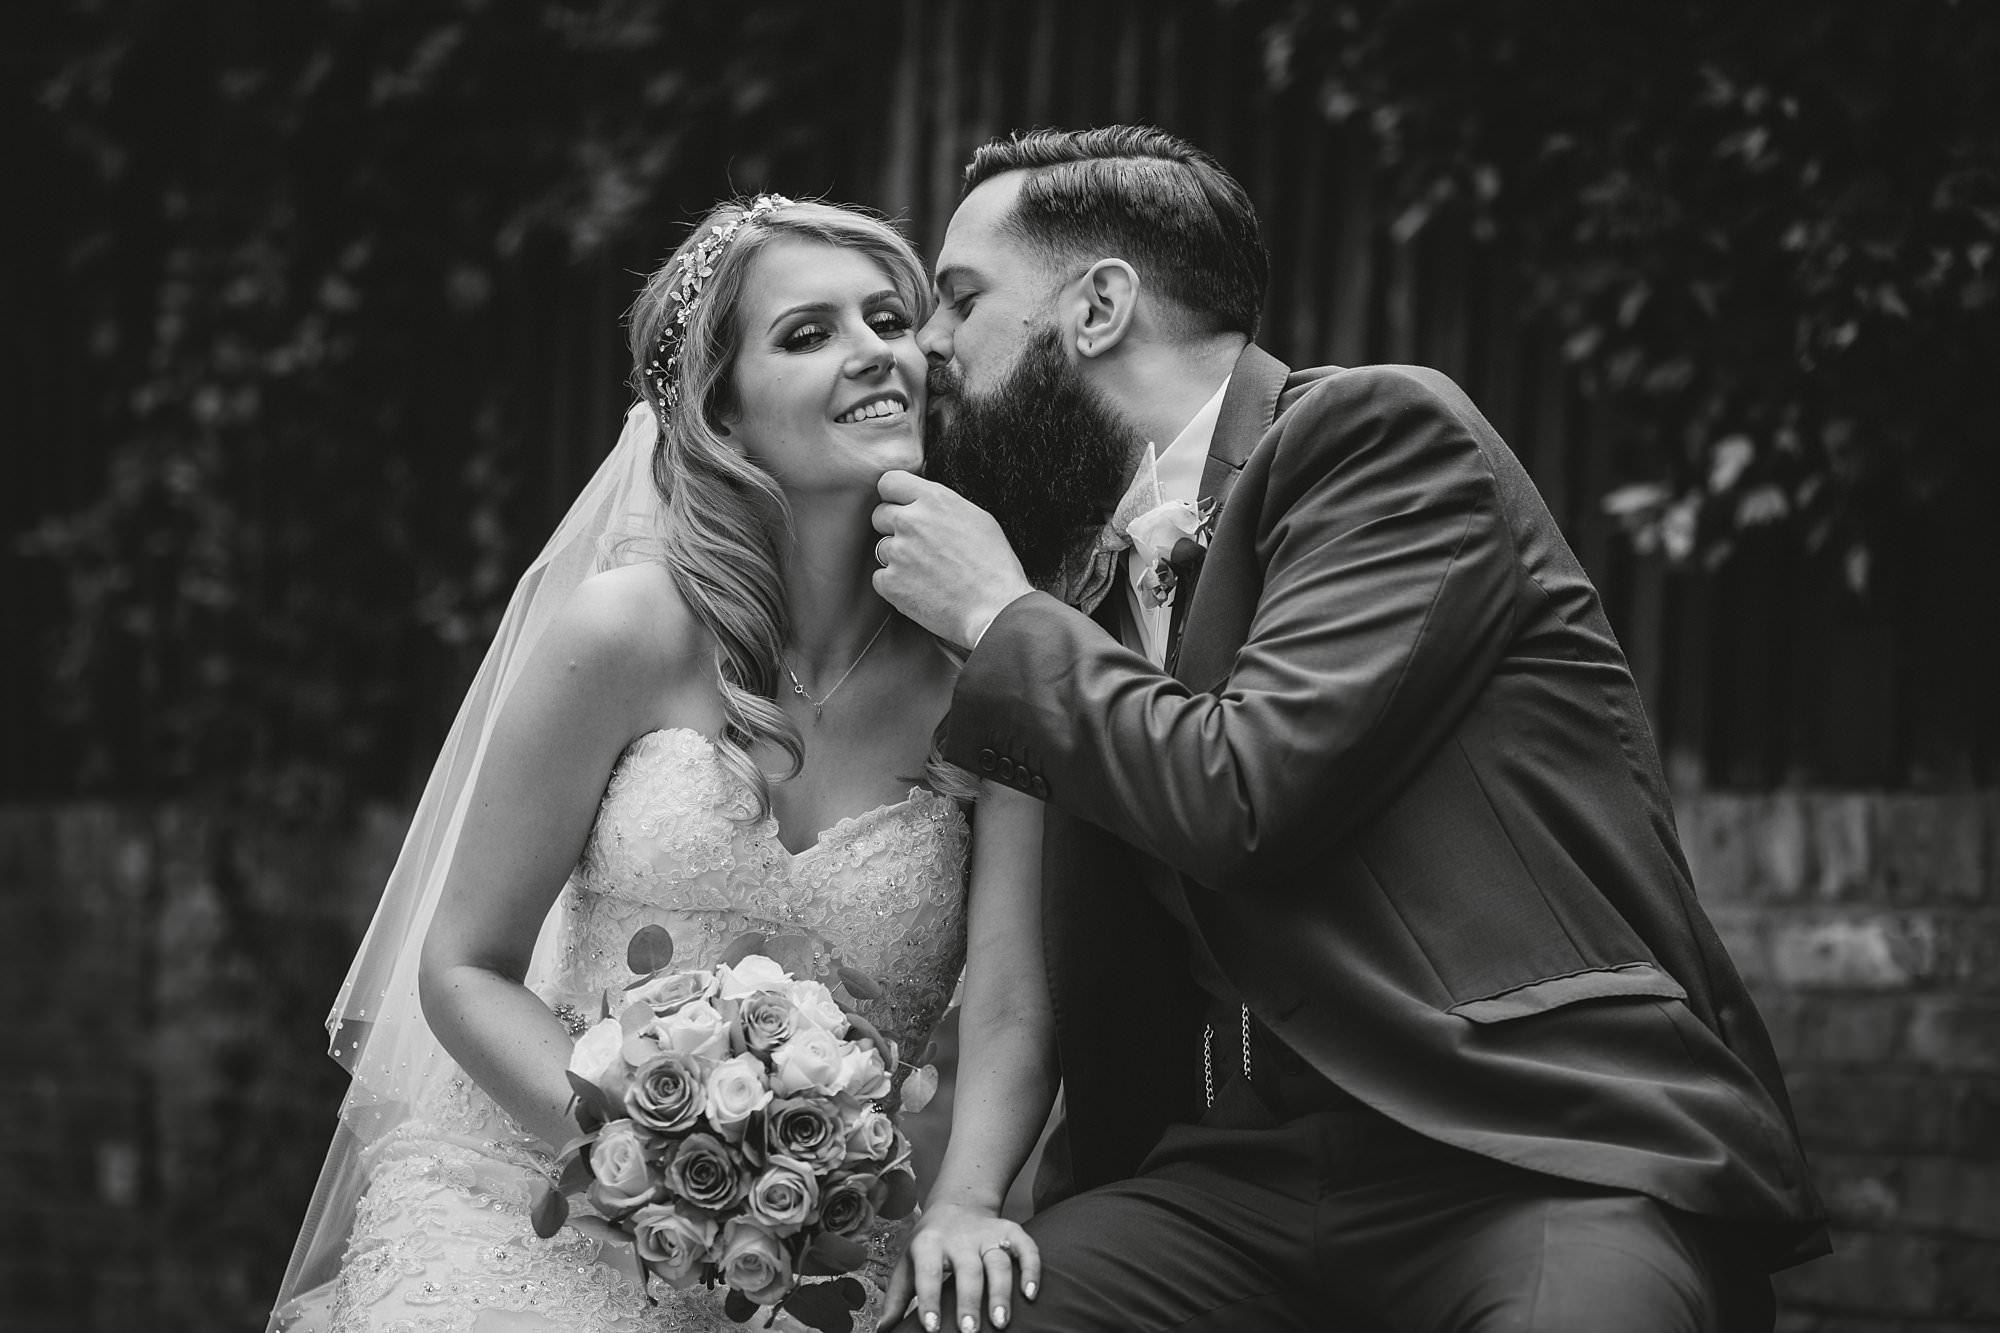 london pub wedding photographer jn 026 - The County Arms Wedding Photographer   Jen & Nick